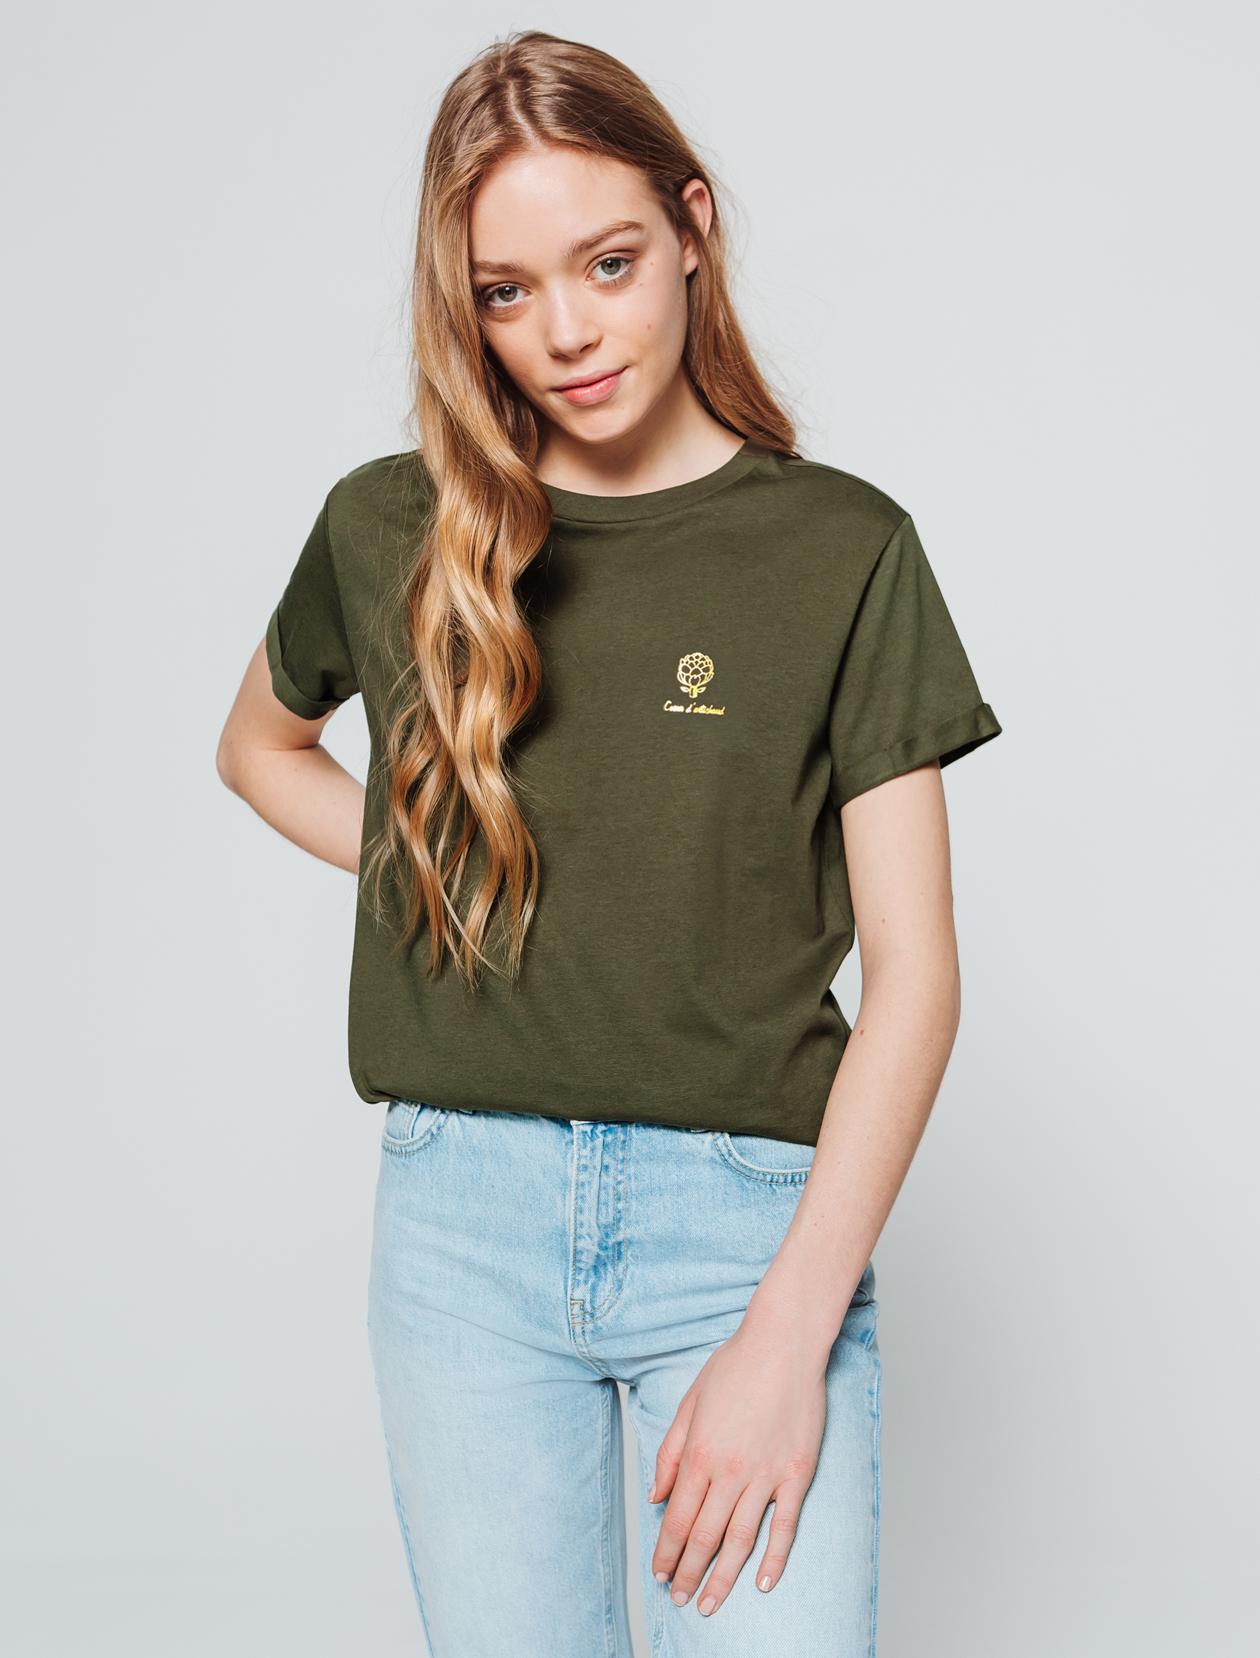 T-shirt Cœur d'artichaut  femme